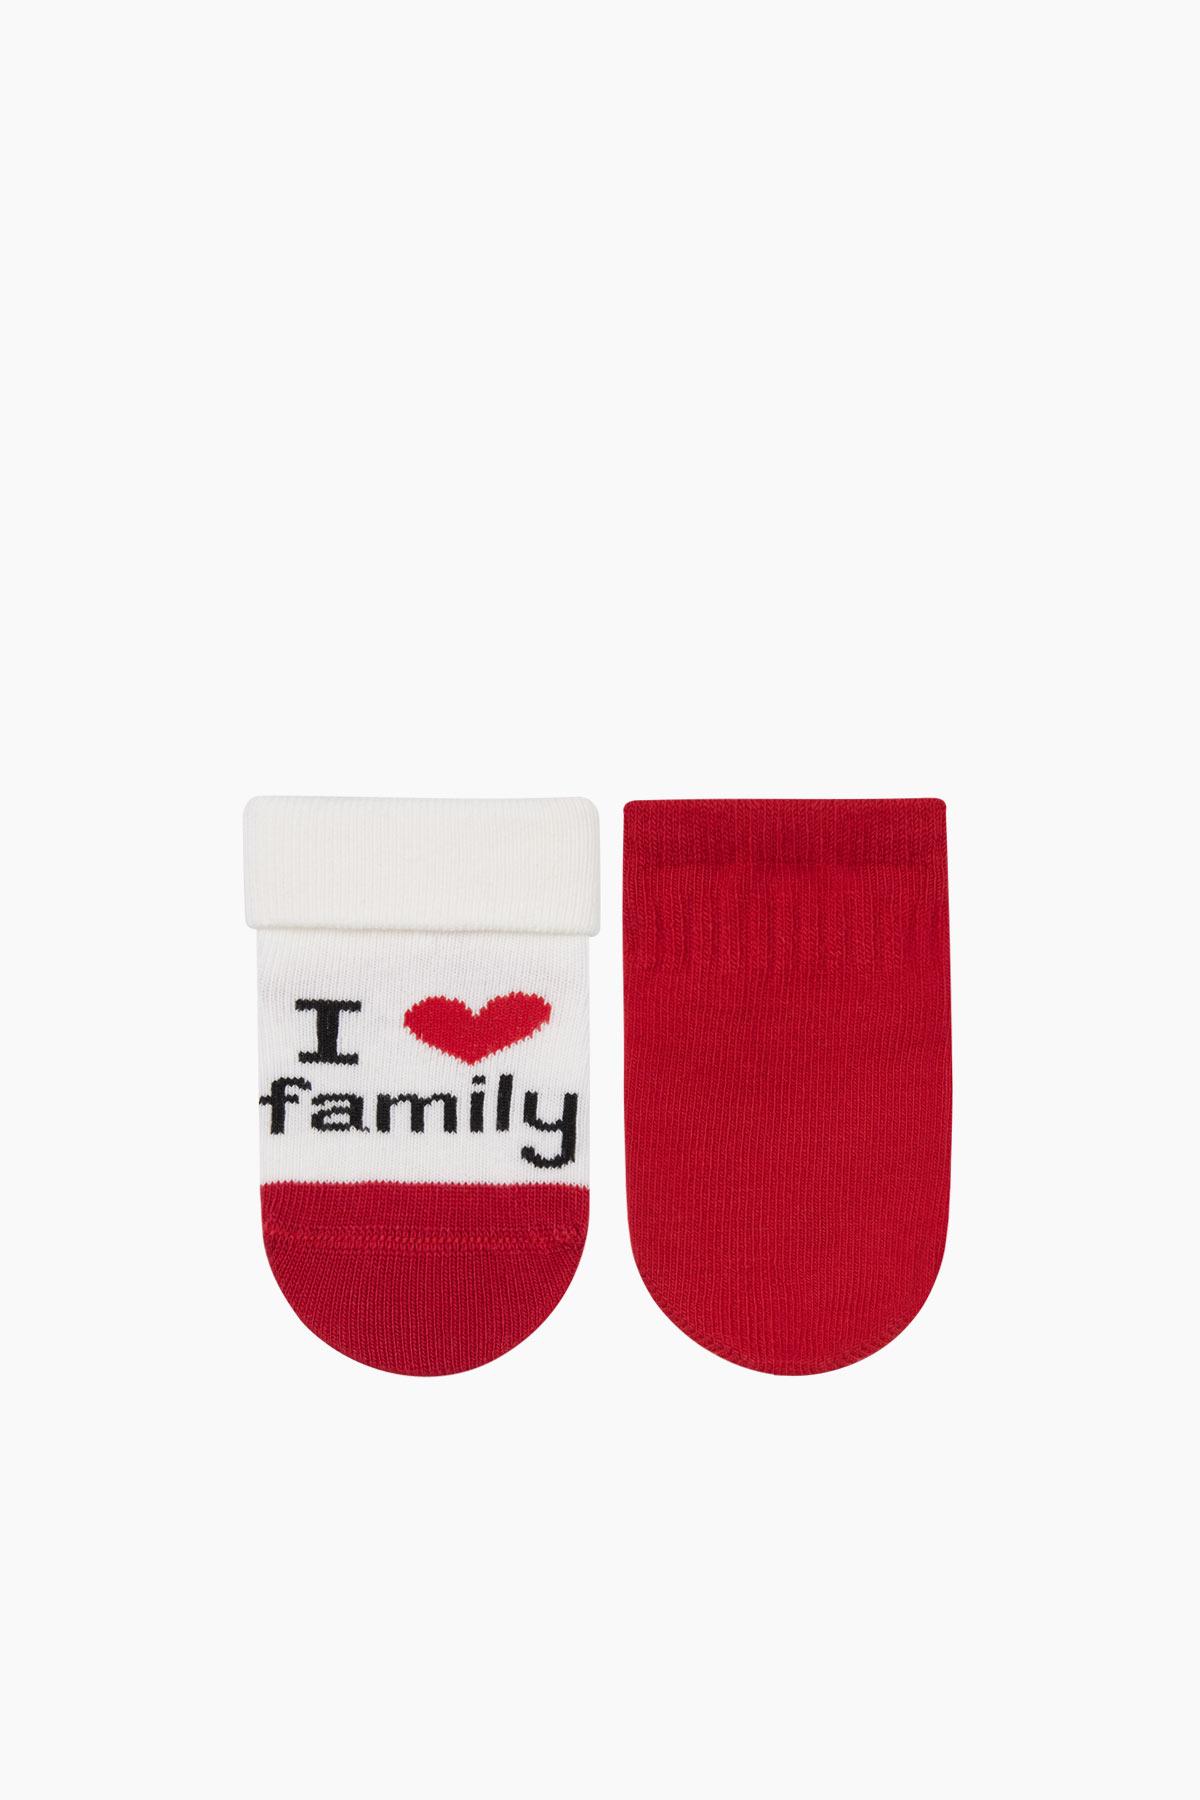 Bross - Bross 2-Pack Newborn Gloves and Socks Combine